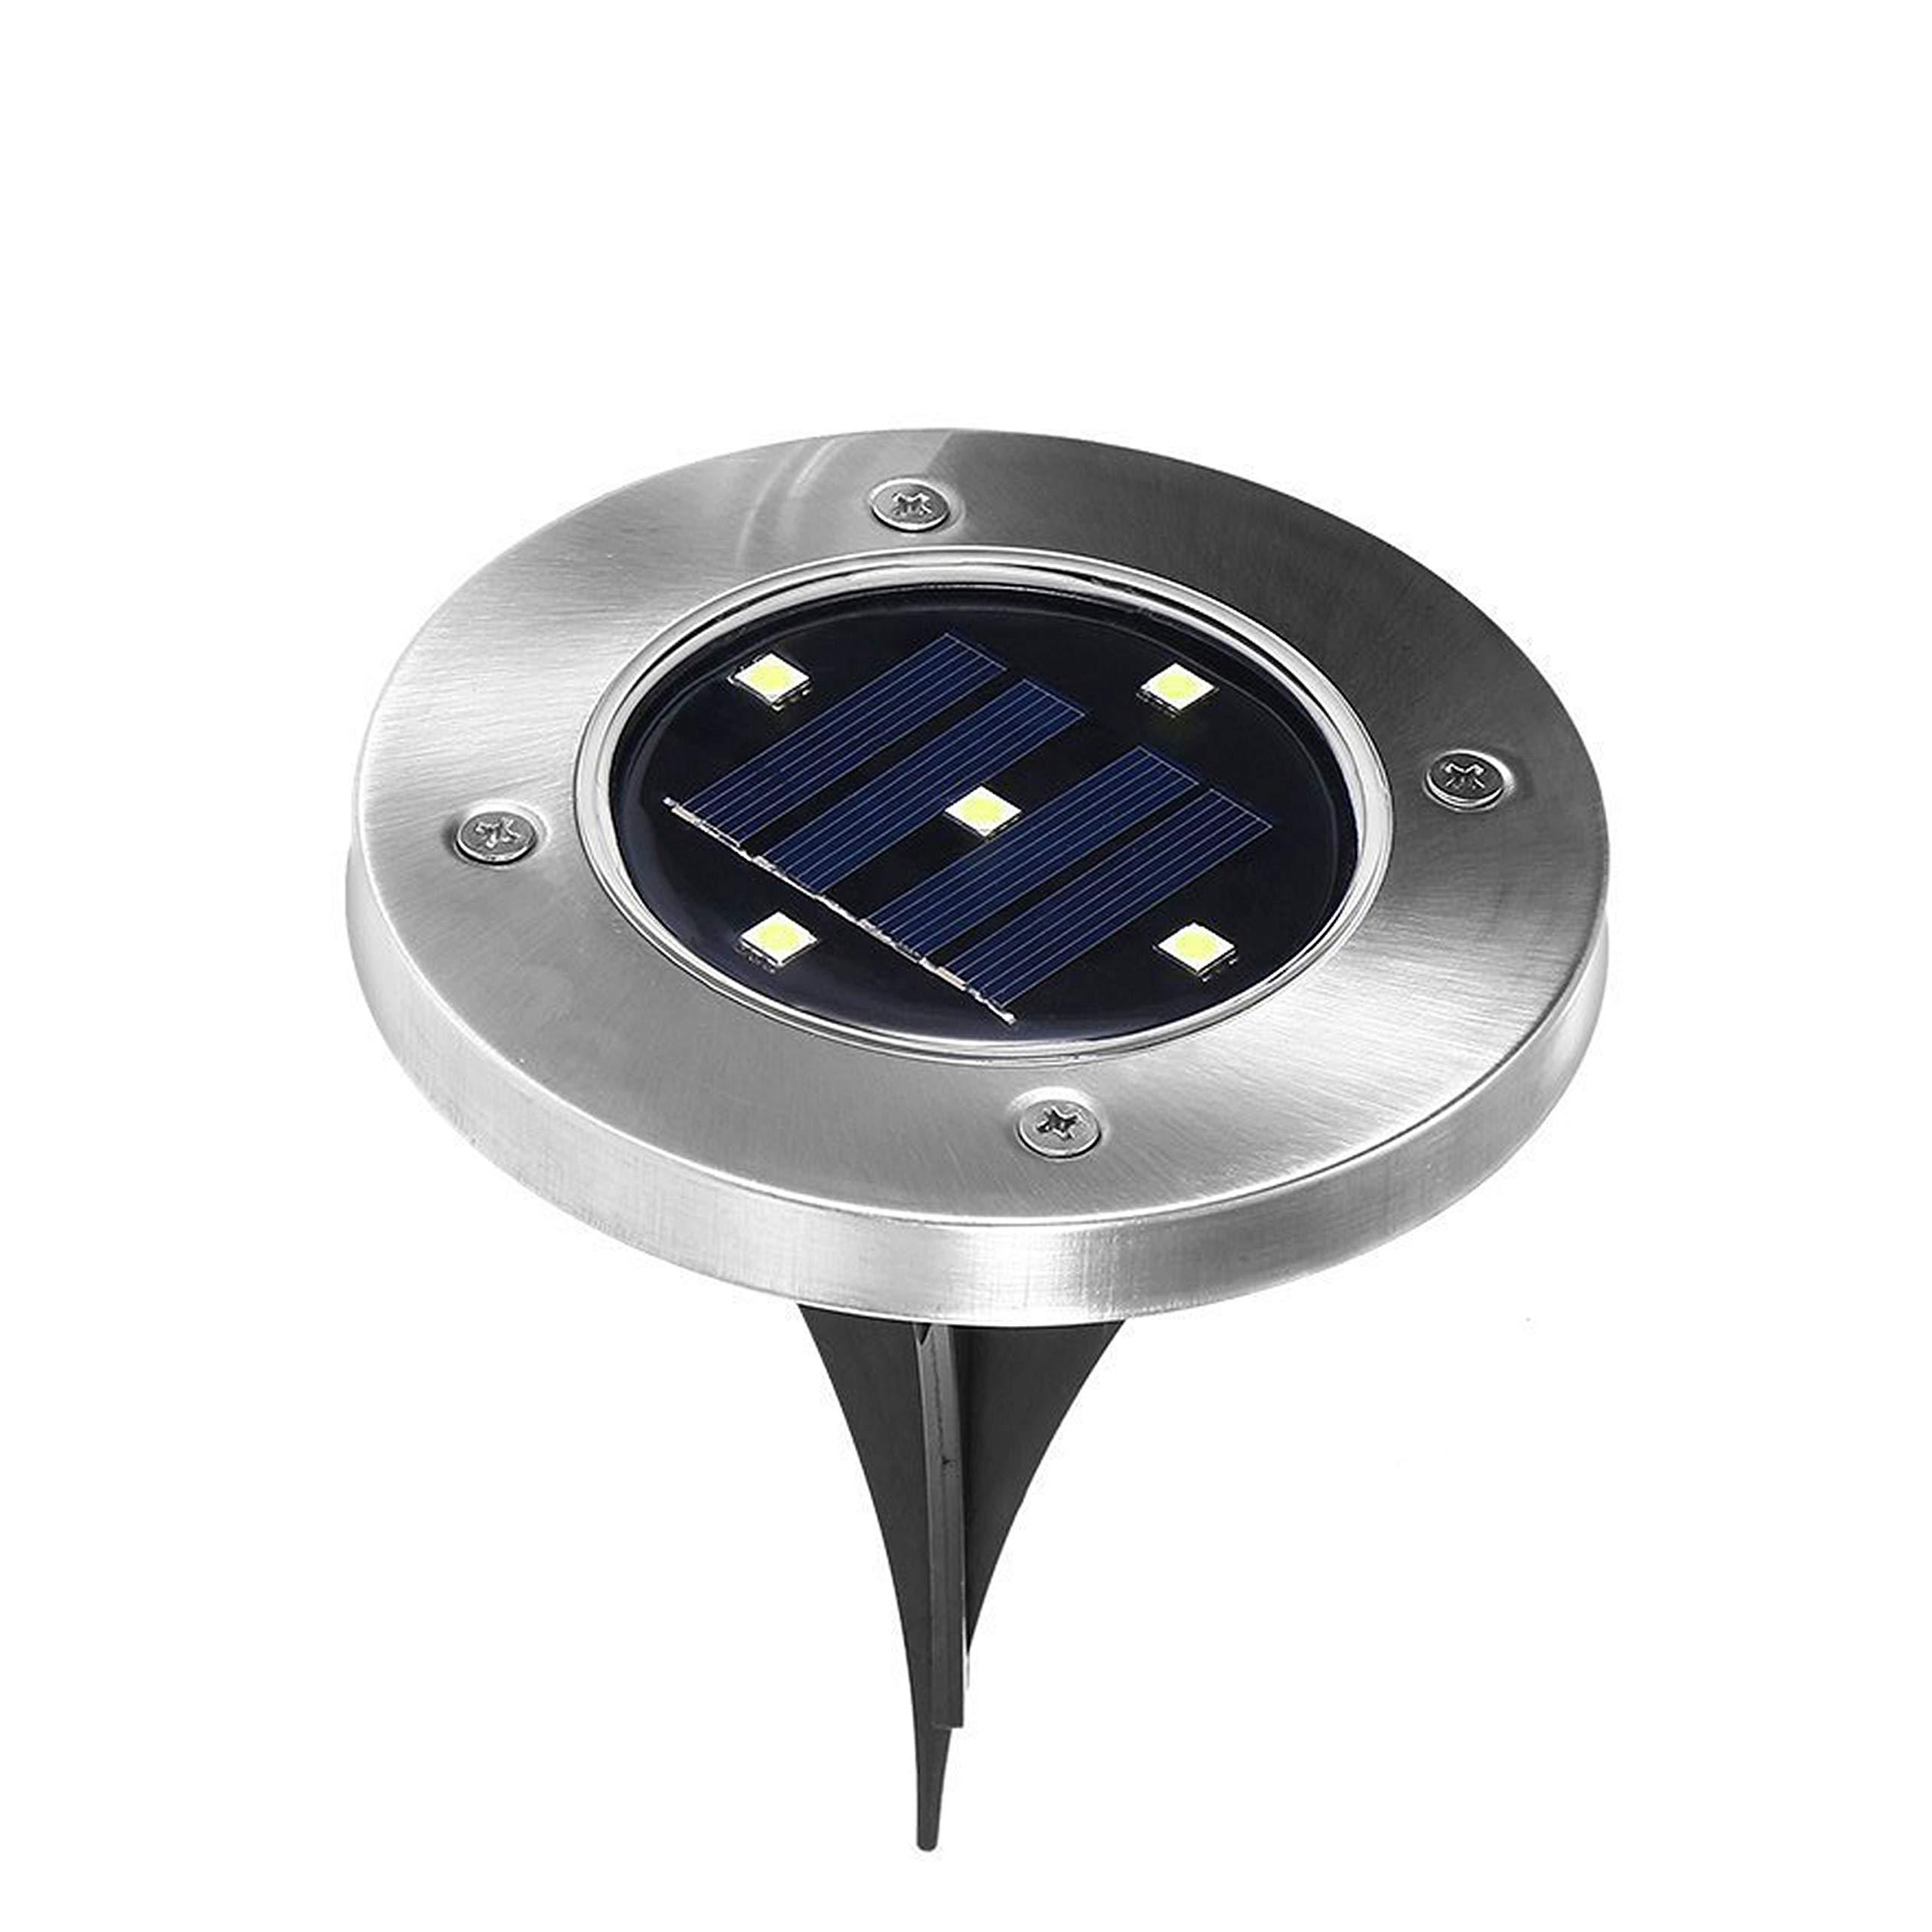 Solar Ground Lights Outdoor, 5LED Waterproof Landscape Lights Disk Lights Solar Garden Lights with Dark Sensing for Lawn Pathway Yard Driveway Walkway Pool Area, White×1pack